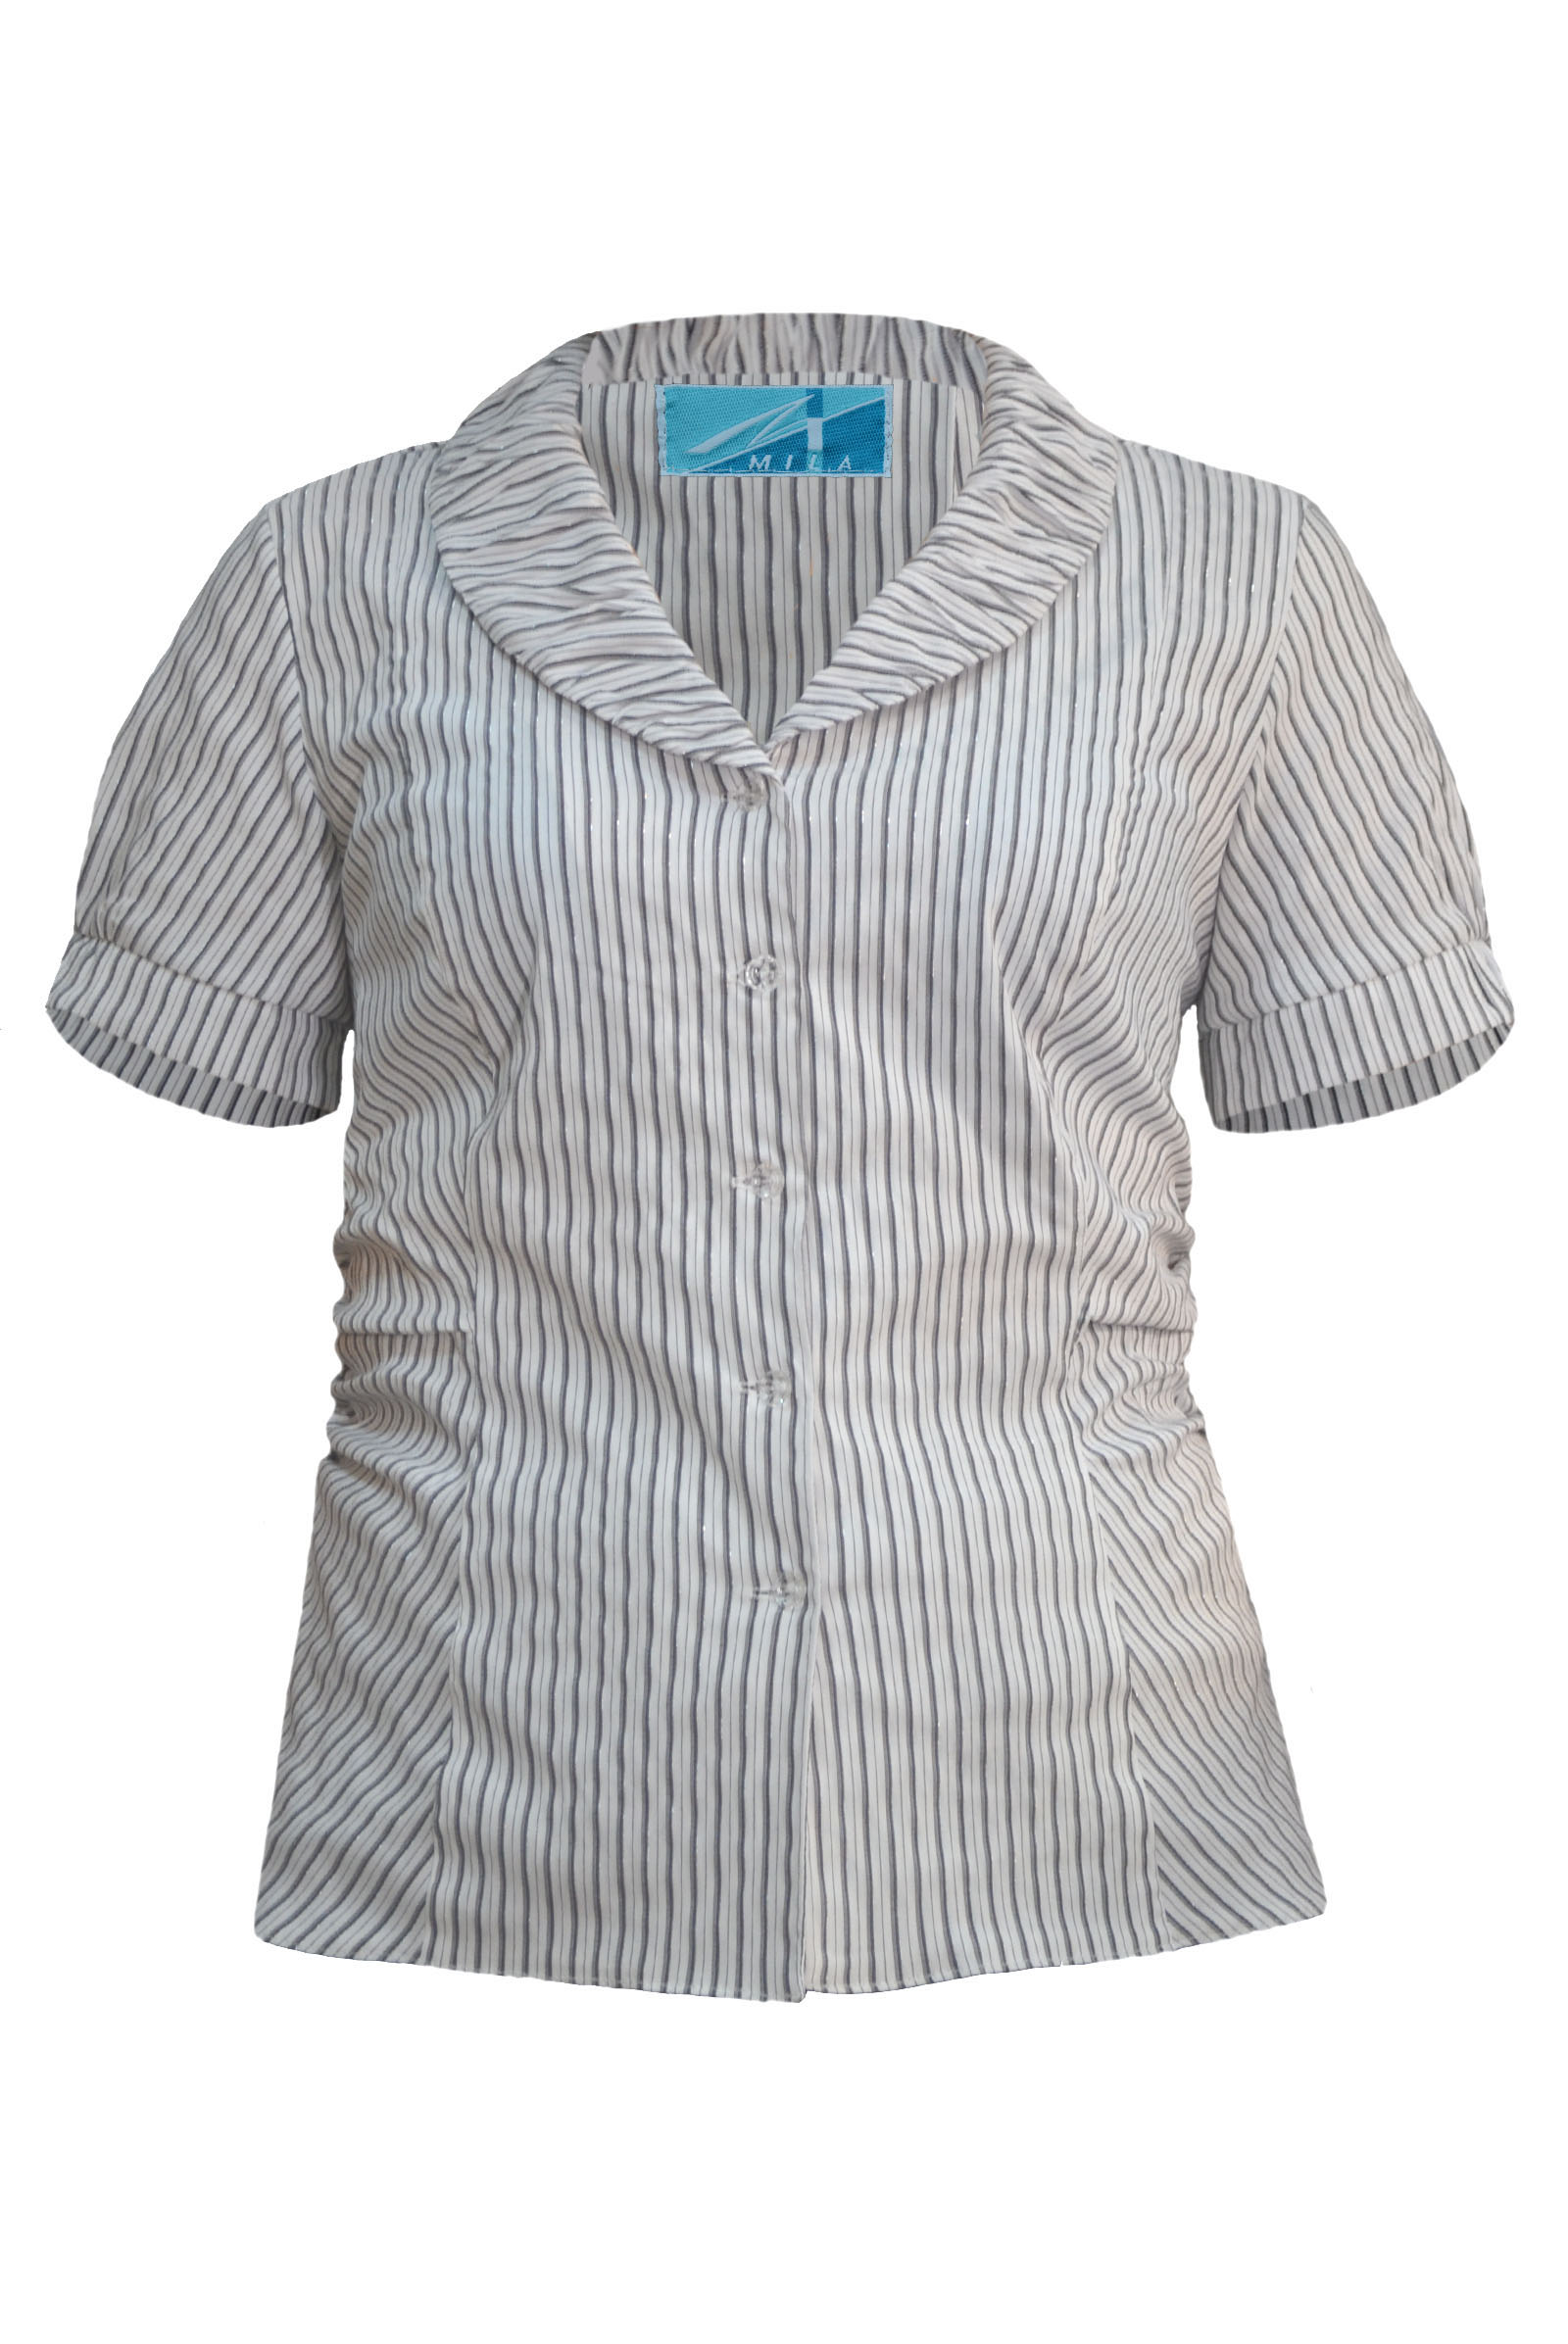 Платья юбки блузки доставка